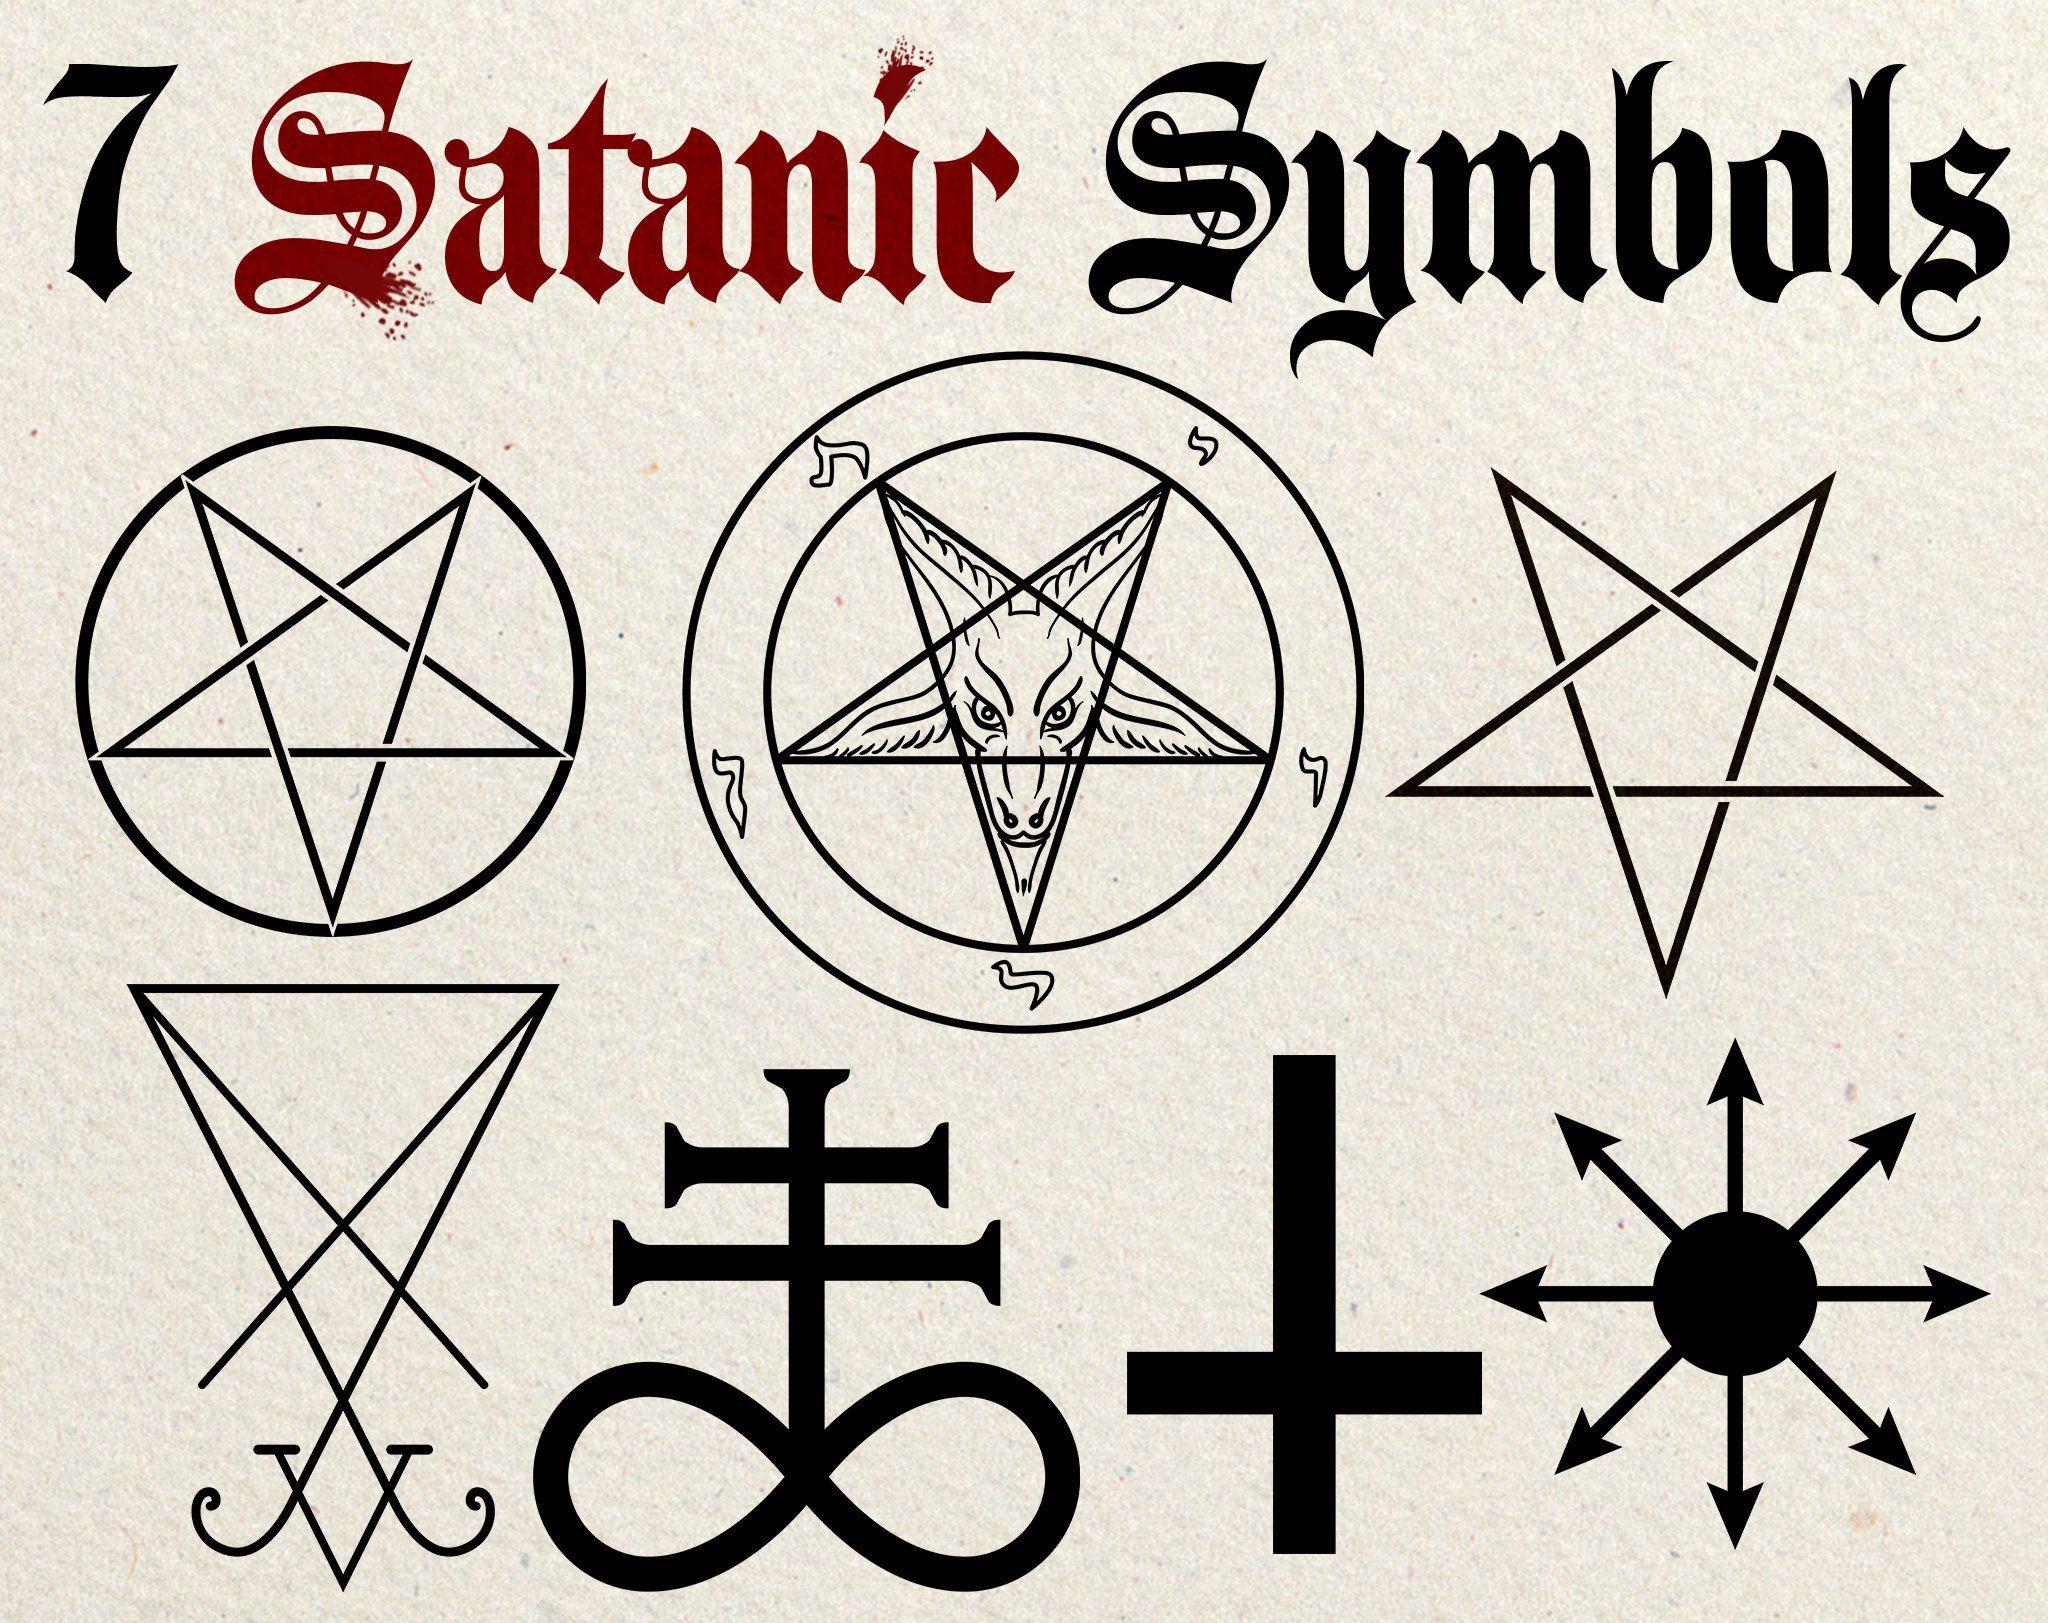 Pentacle vector clipart graphic download Satanic Symbols Clip Art Vector | Crafts in 2019 | Satanic art ... graphic download